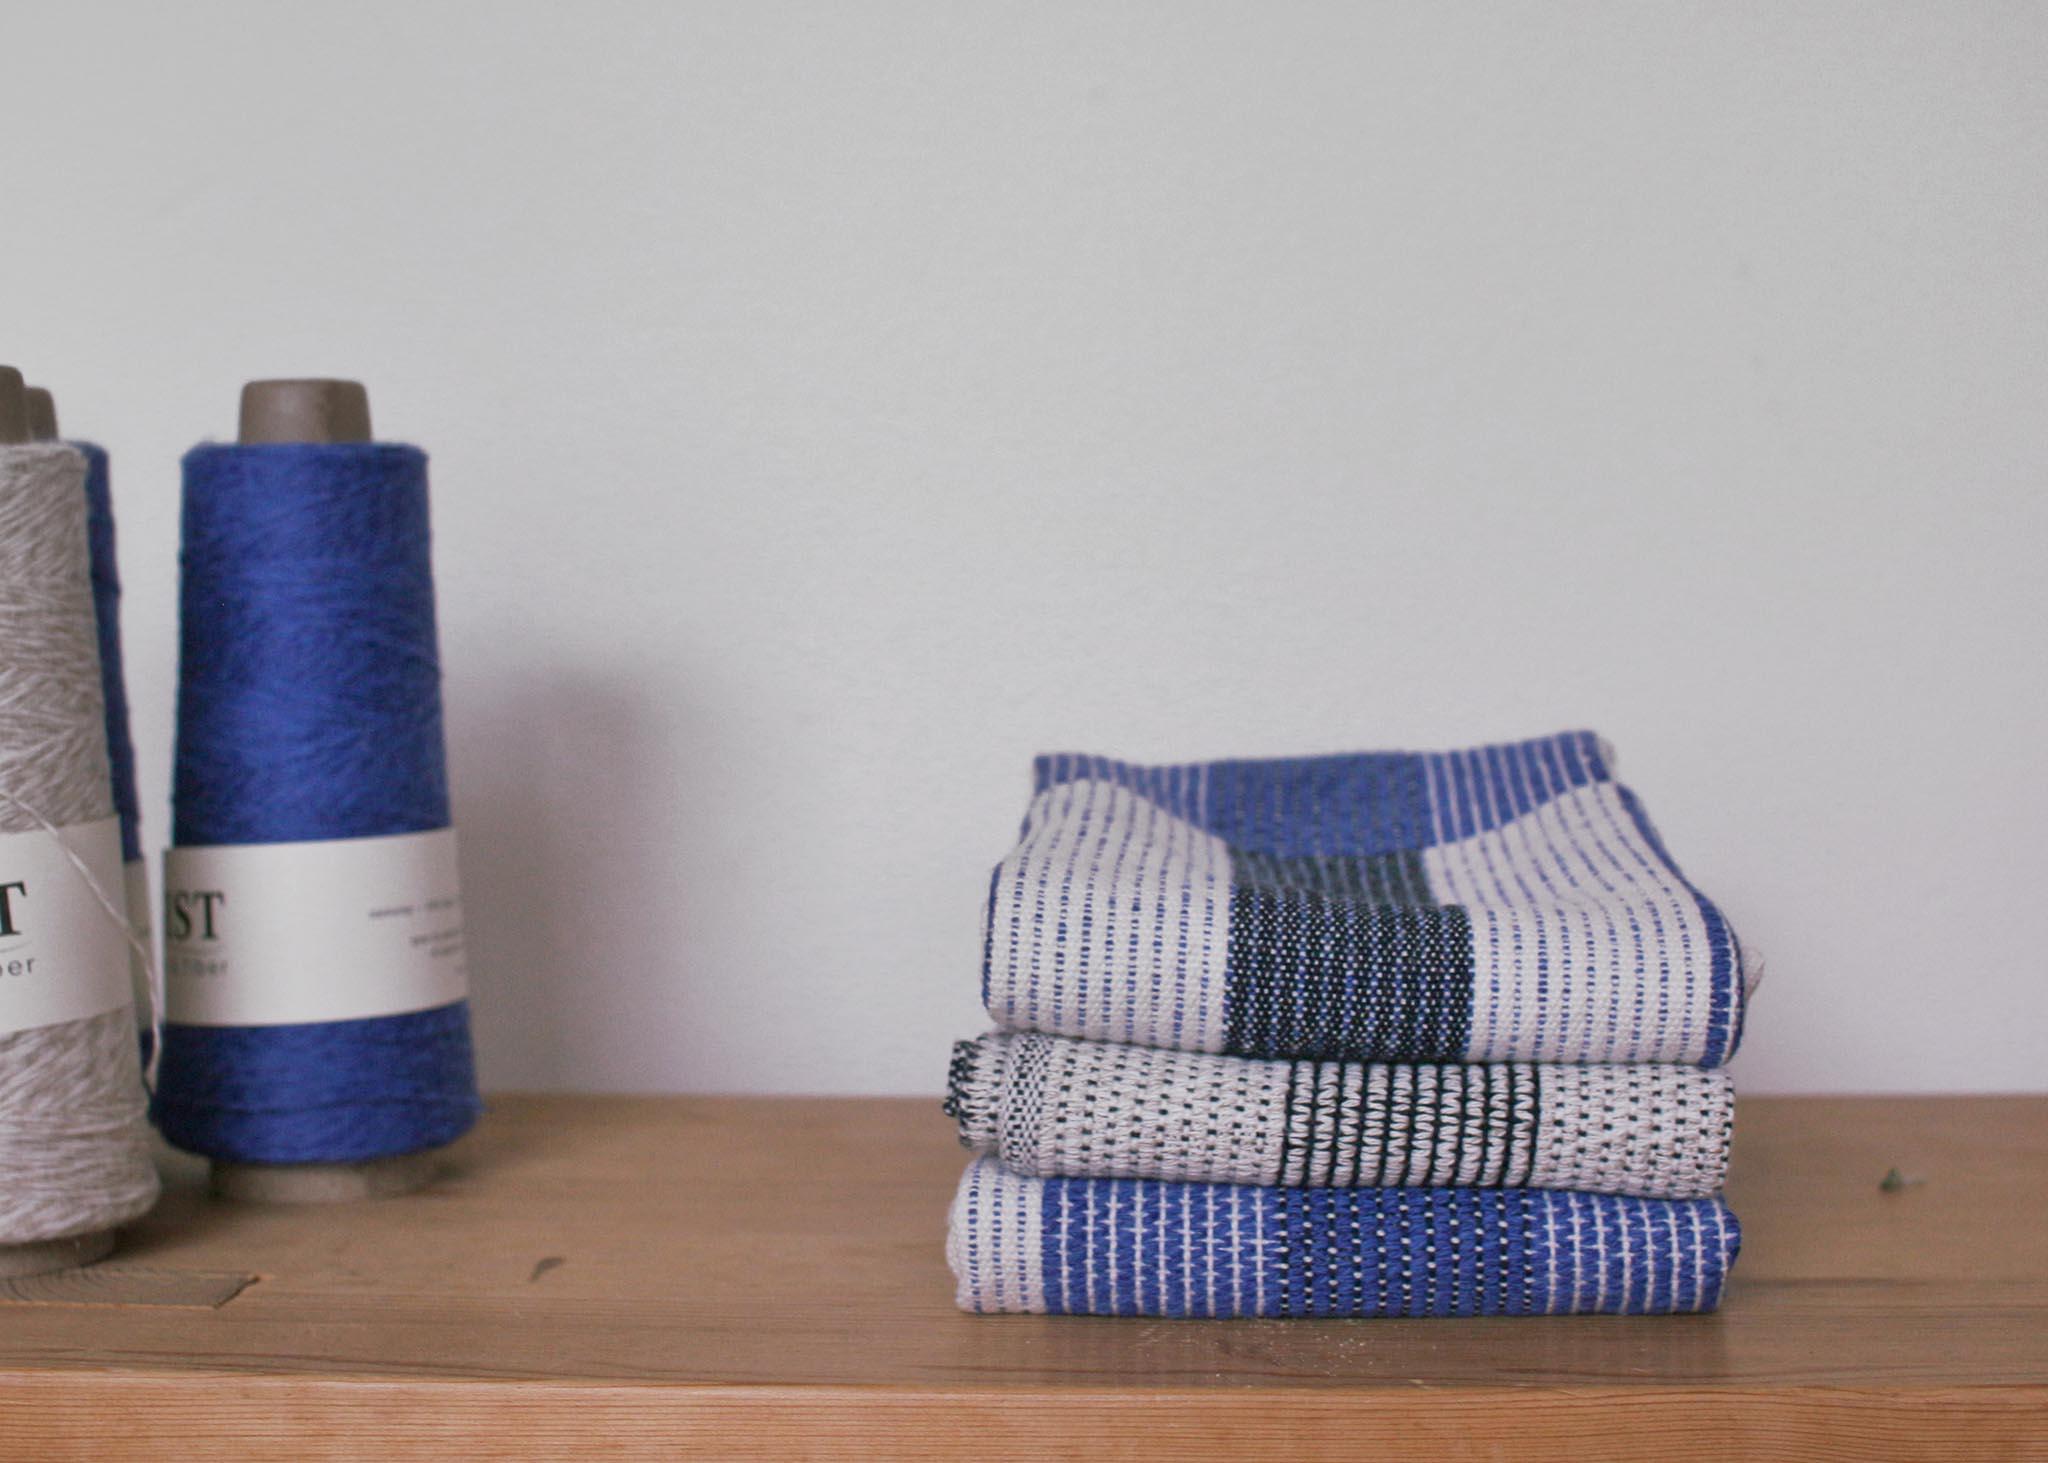 Yarn for Handwoven Halvdräll Towels